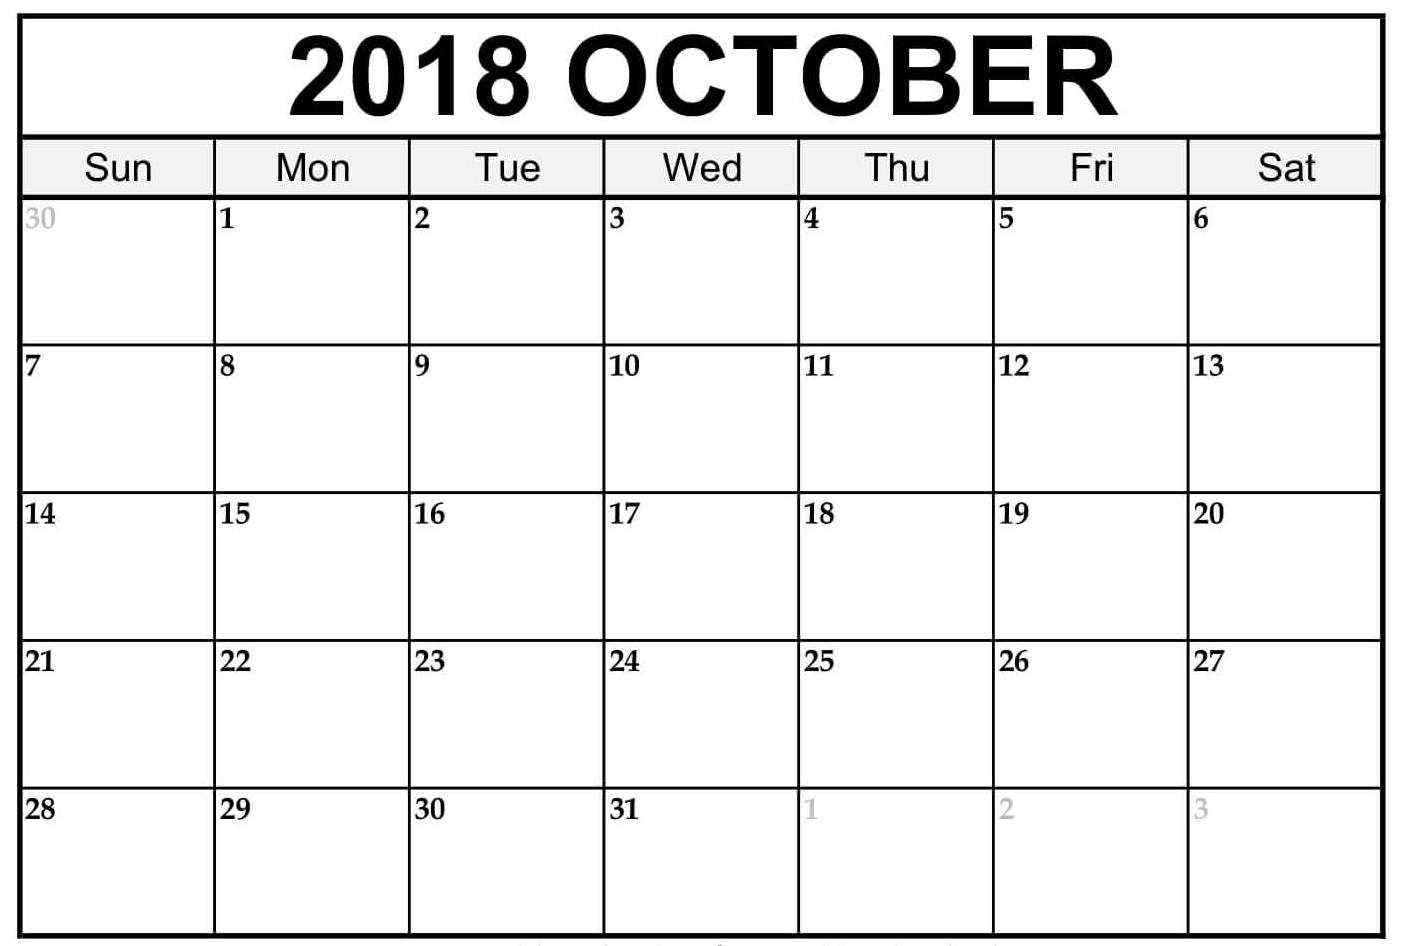 free printable 2018 calendar templates Calendar October 2018 Printables erdferdf